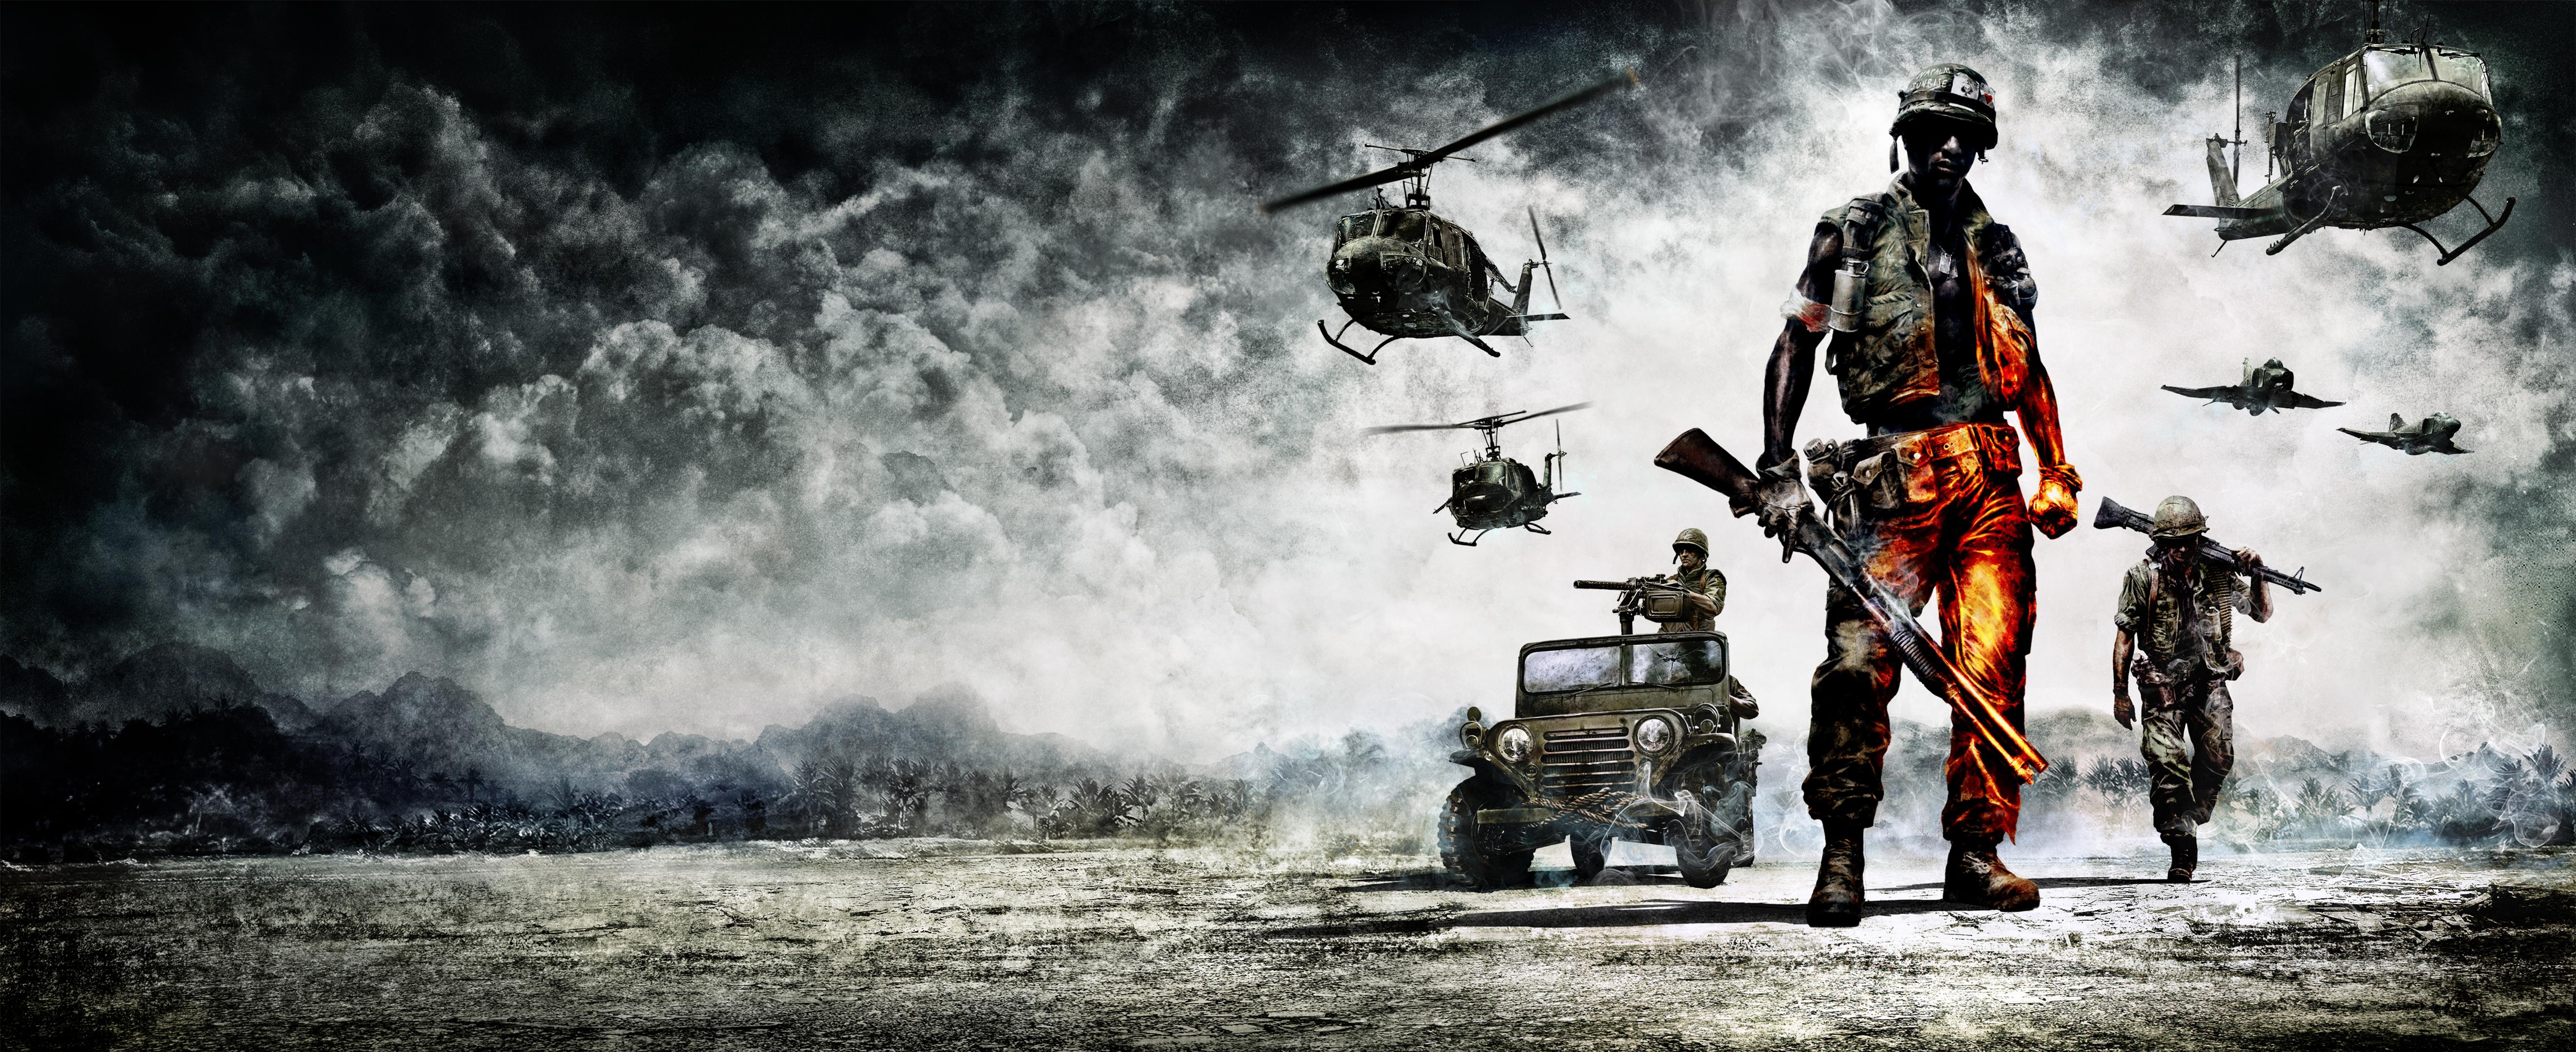 Bad Company 2 Vietnam Key Art 4k Ultra Hd Wallpaper Background